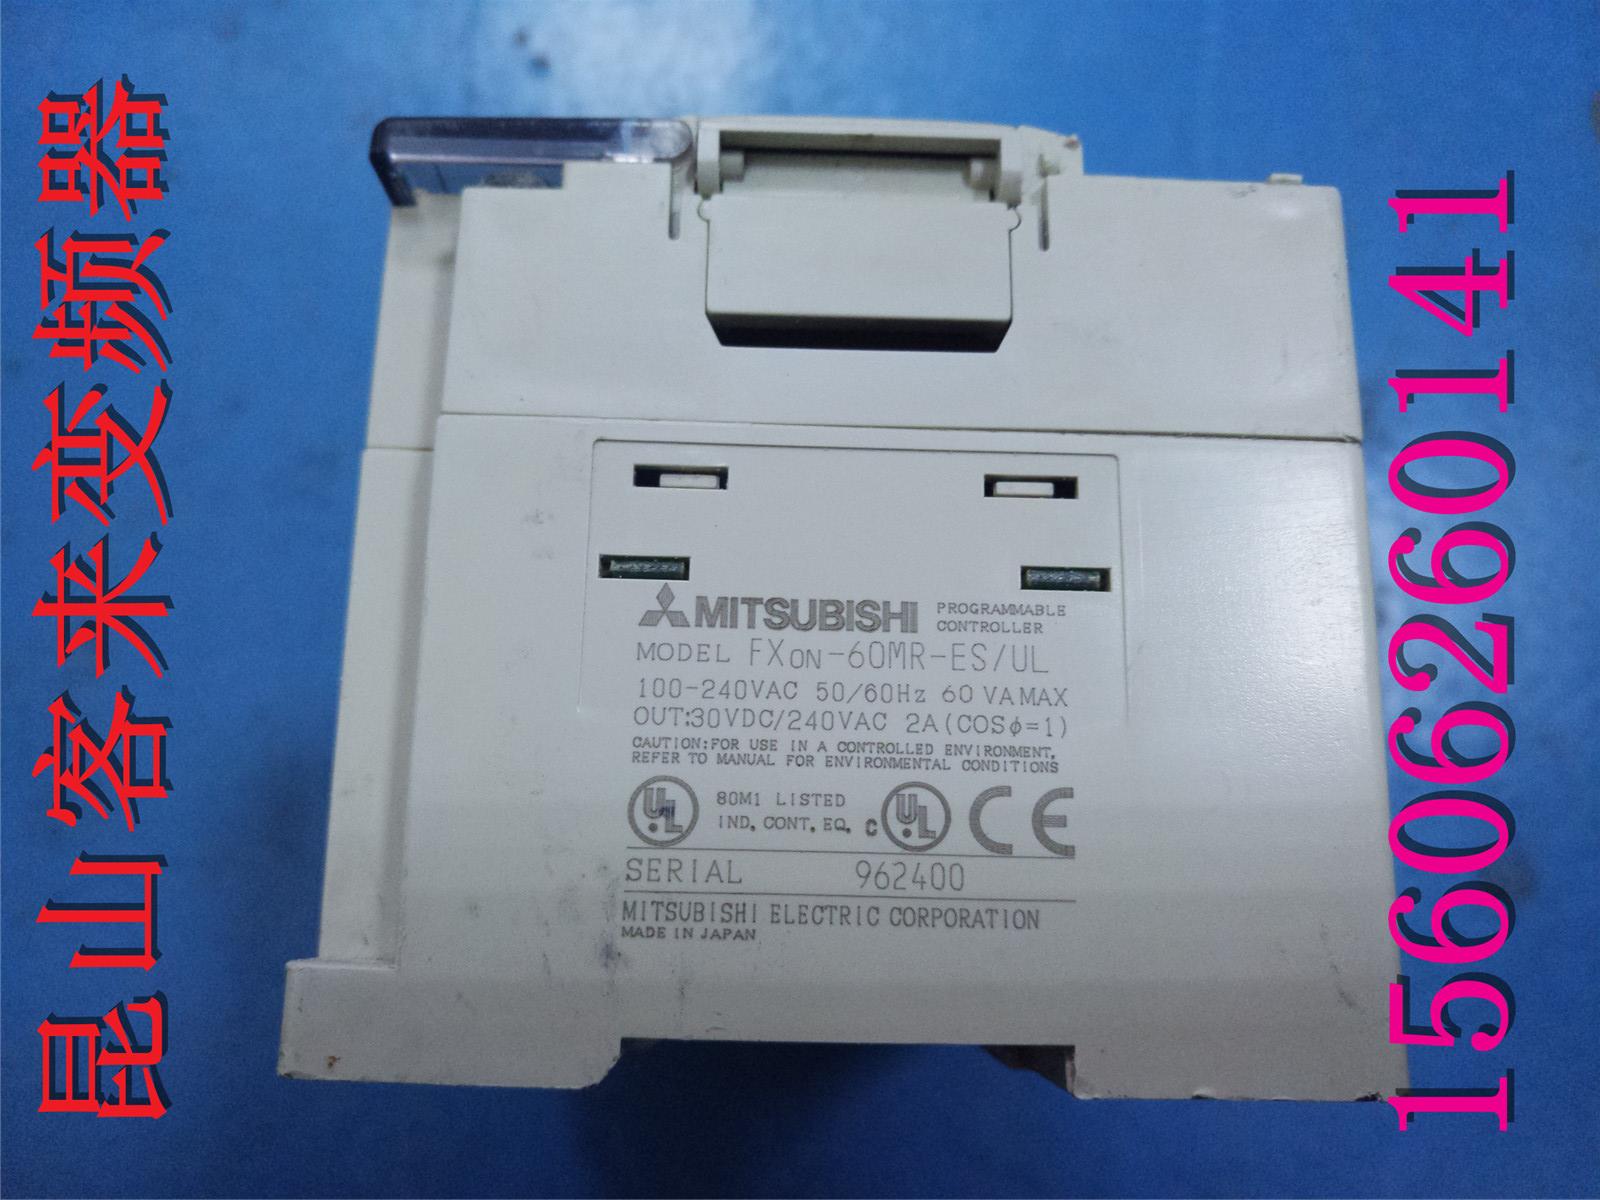 PLCプログラマブルコントローラFX0N-60MR-ES / UL規格品の中古の包みが保